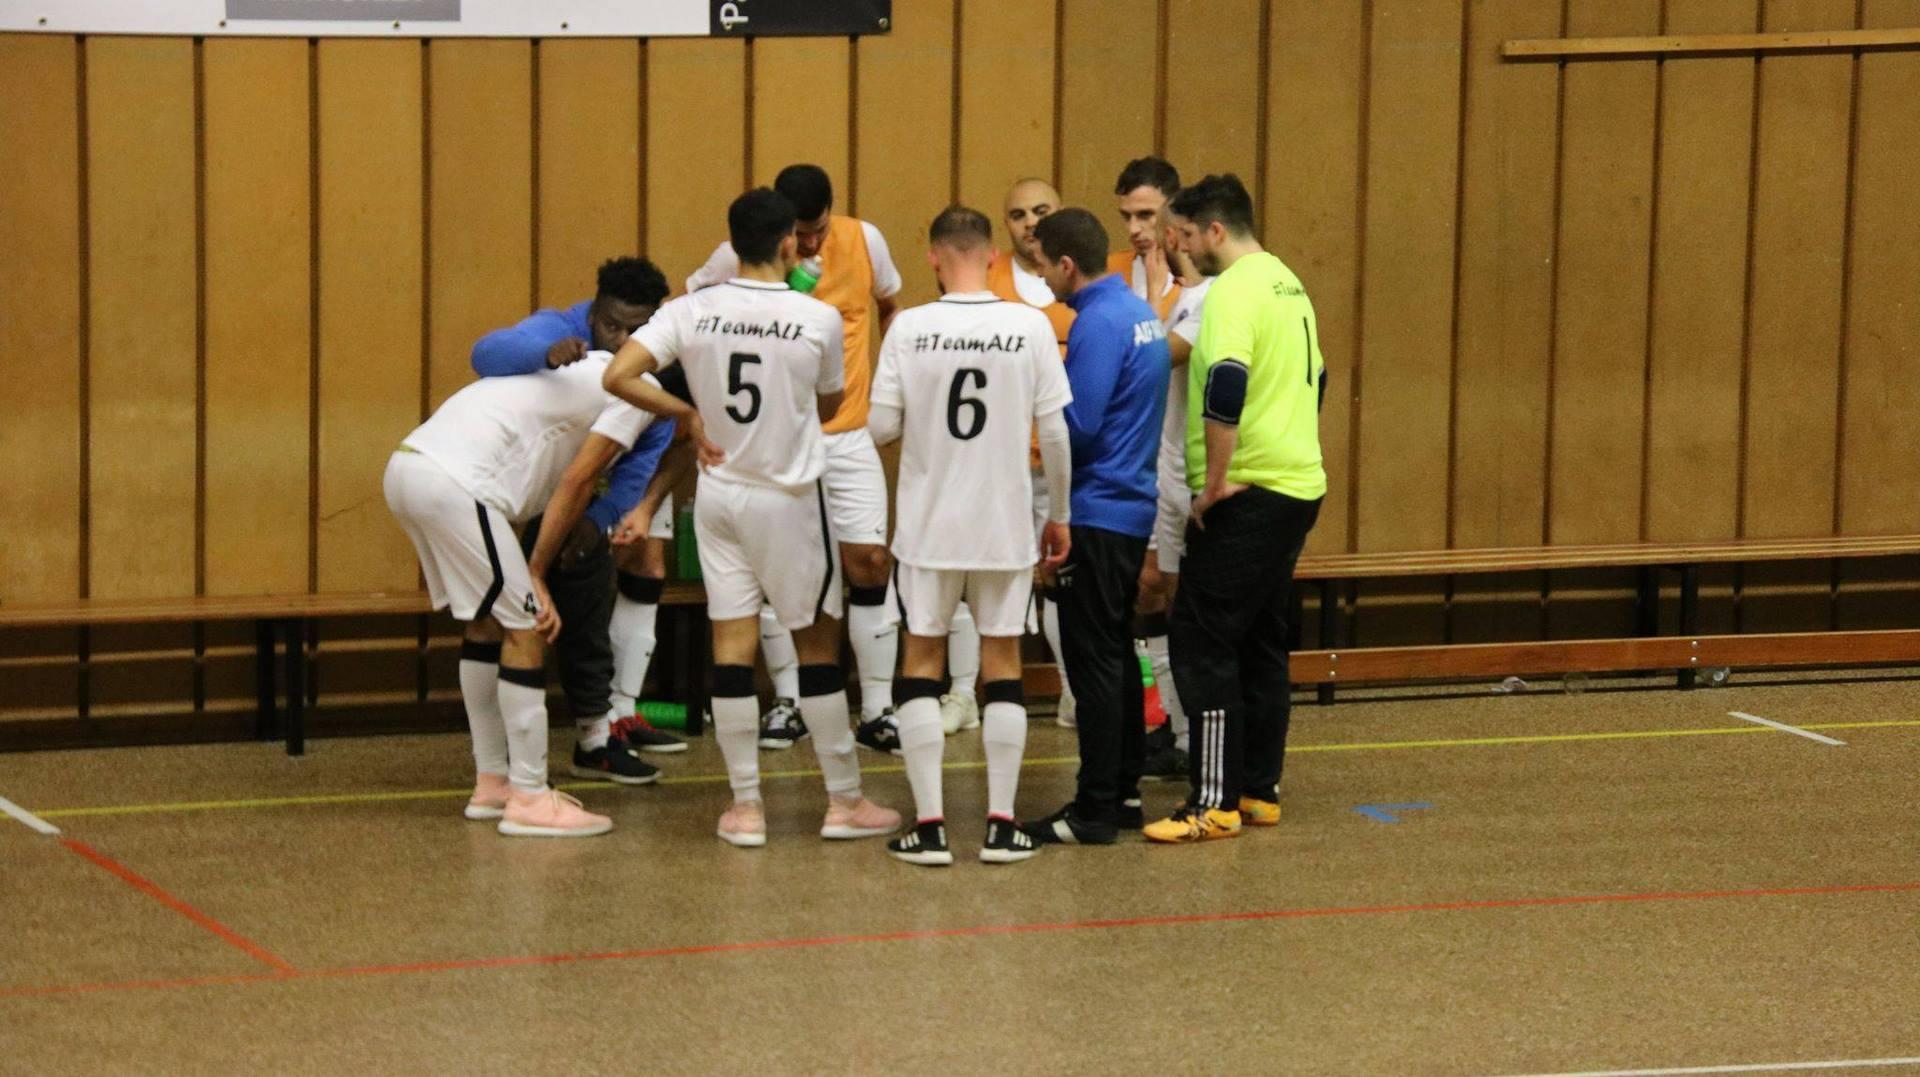 équipe ALF vs Vaulx futsal coaching